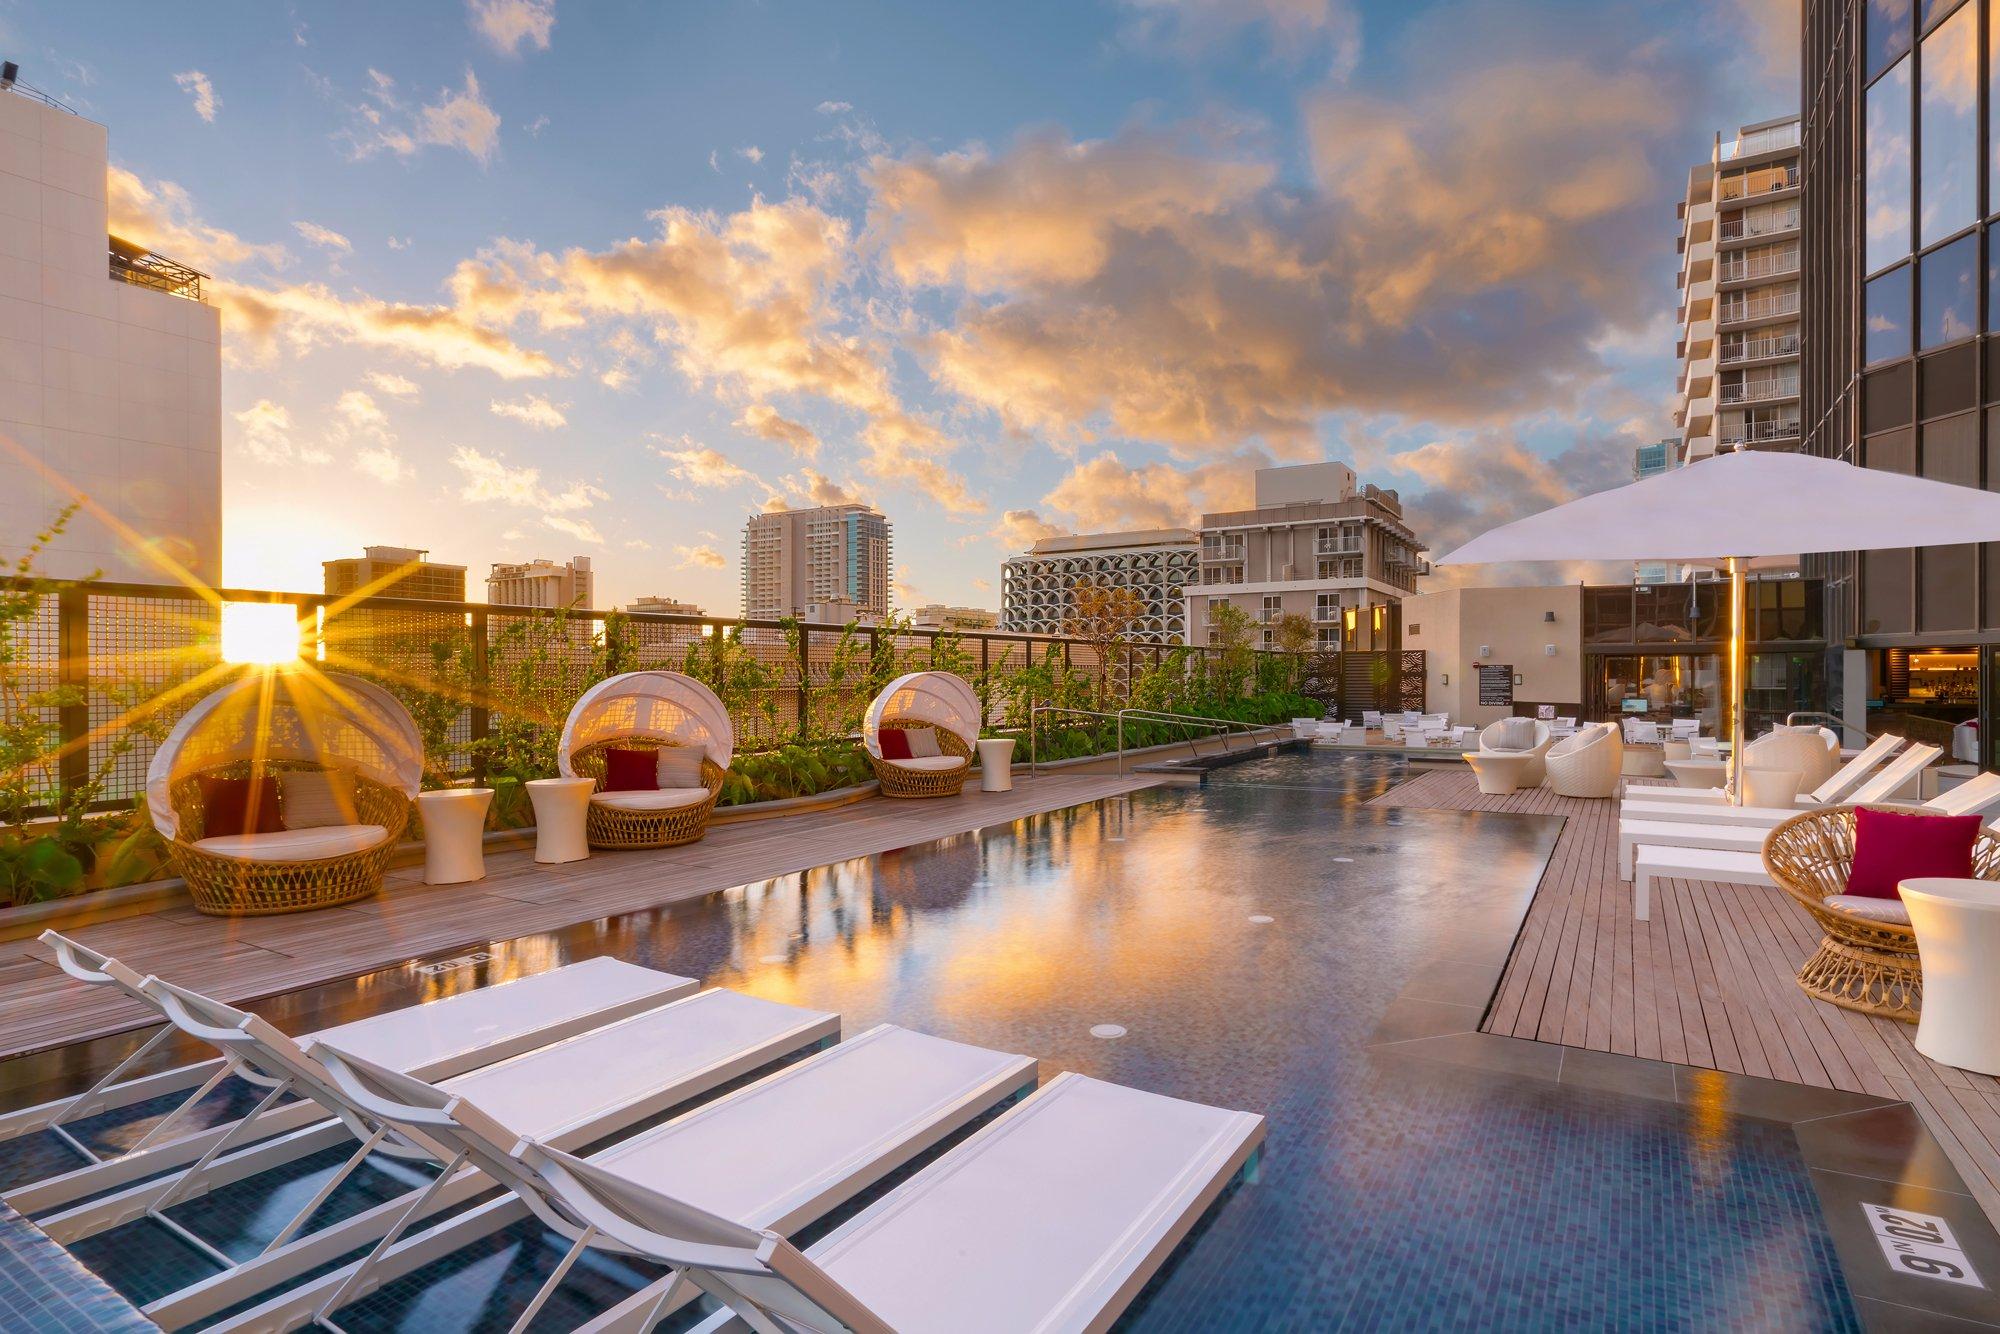 Hyatt Centric Waikiki Beach Updated 2017 Prices Hotel Reviews Honolulu Hi Tripadvisor